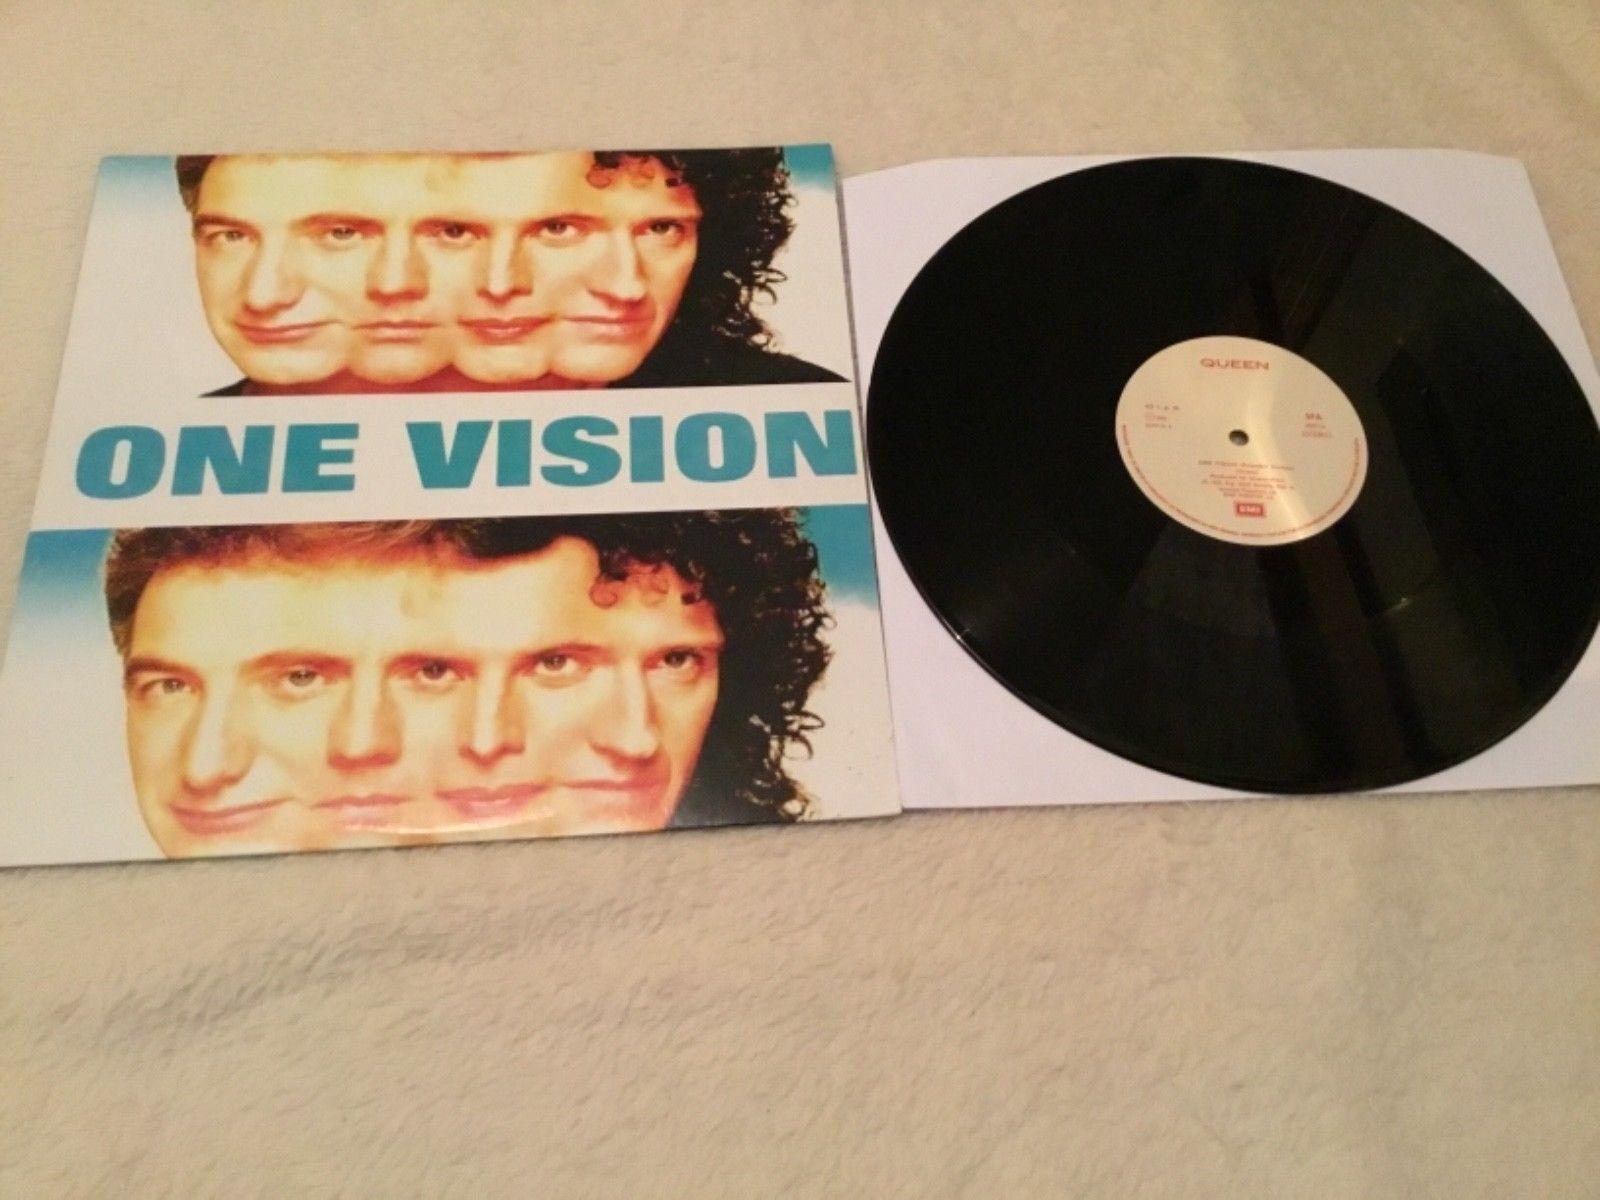 "Queen ""One Vision"" Original 1985 Portugal 12 inch D.J. Copy"